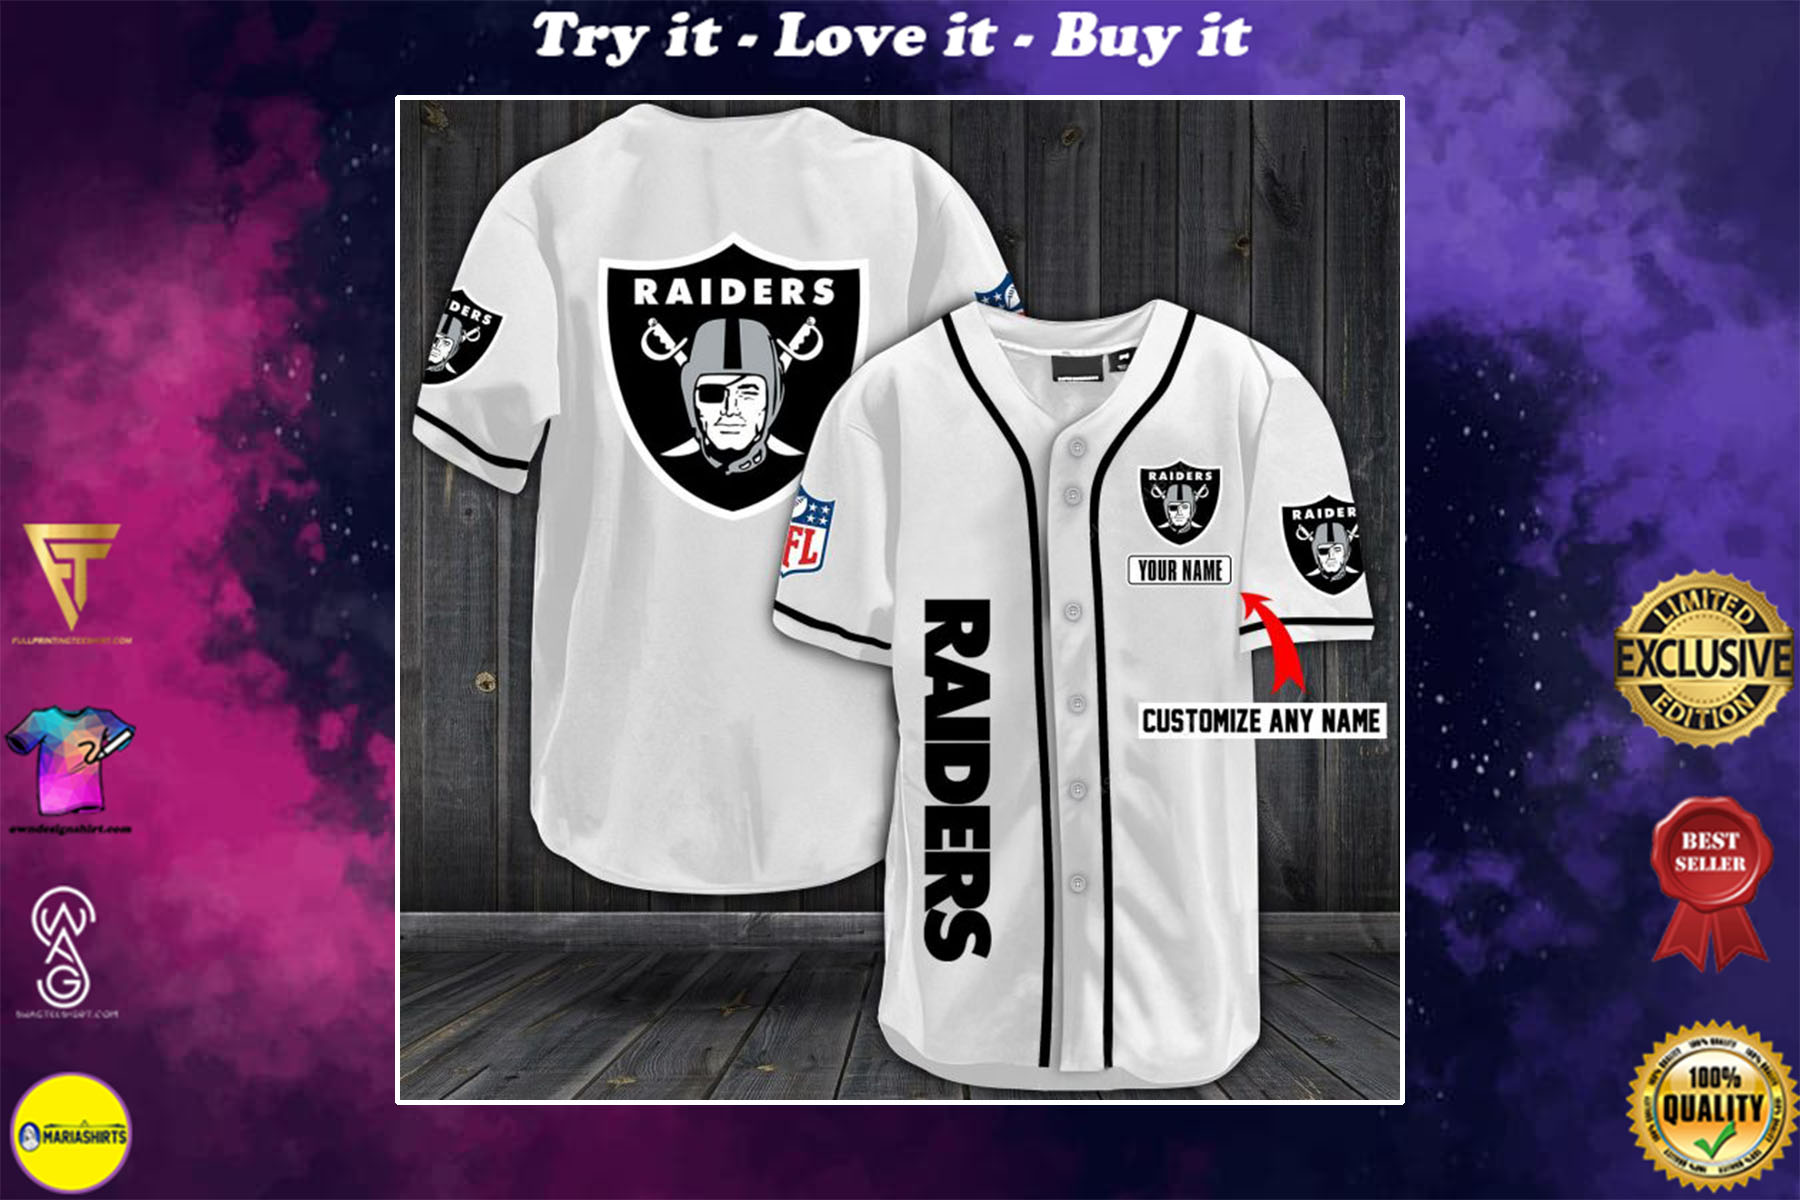 personalized name las vegas raiders full printing baseball shirt - maria